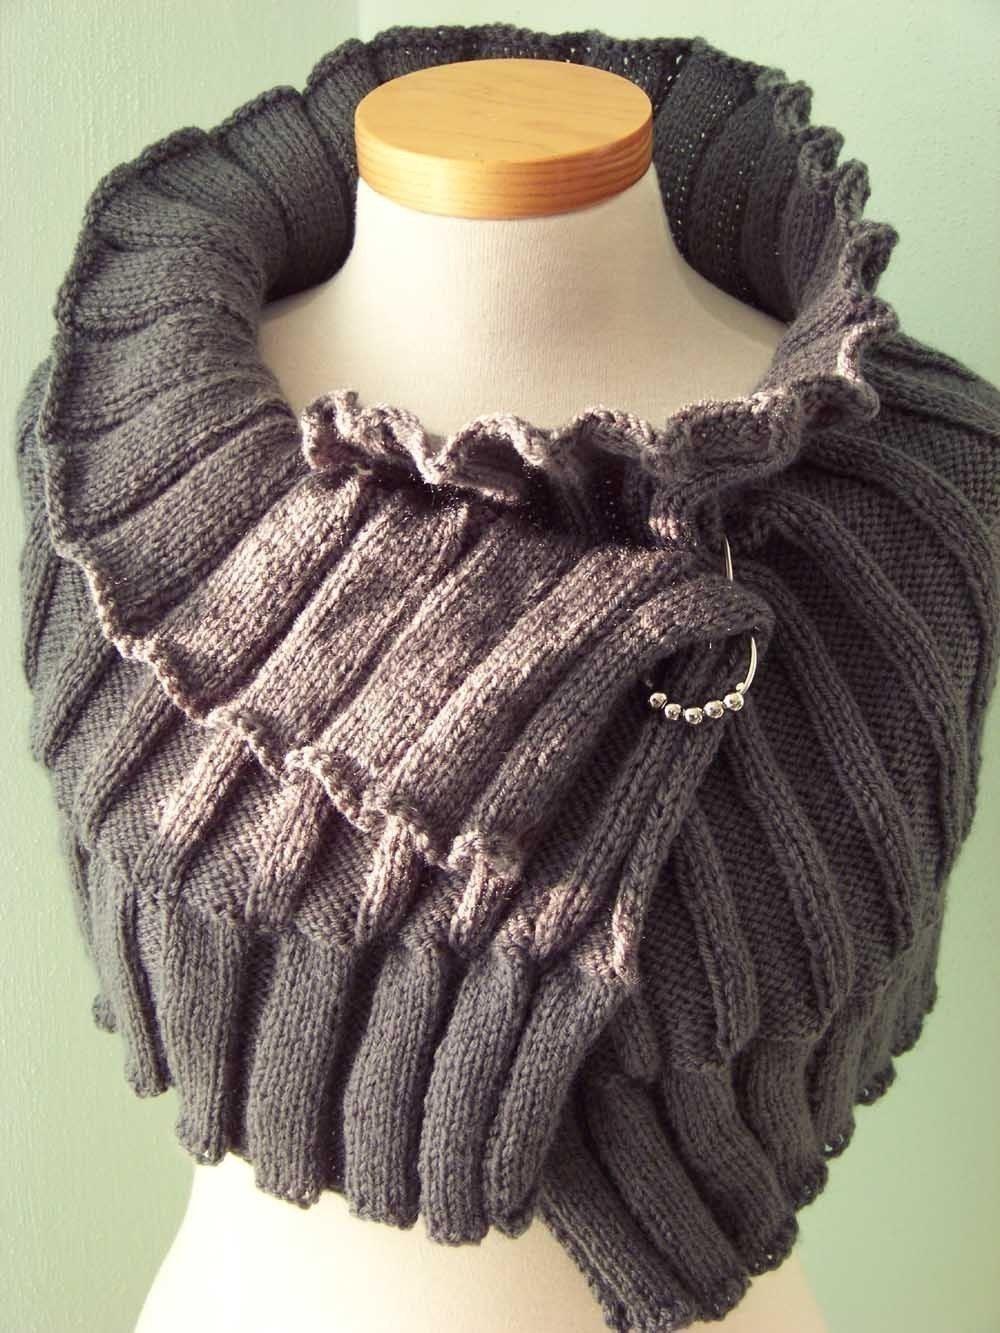 Knit Capelet Pattern : SELMA Knitting capelet pattern PDF